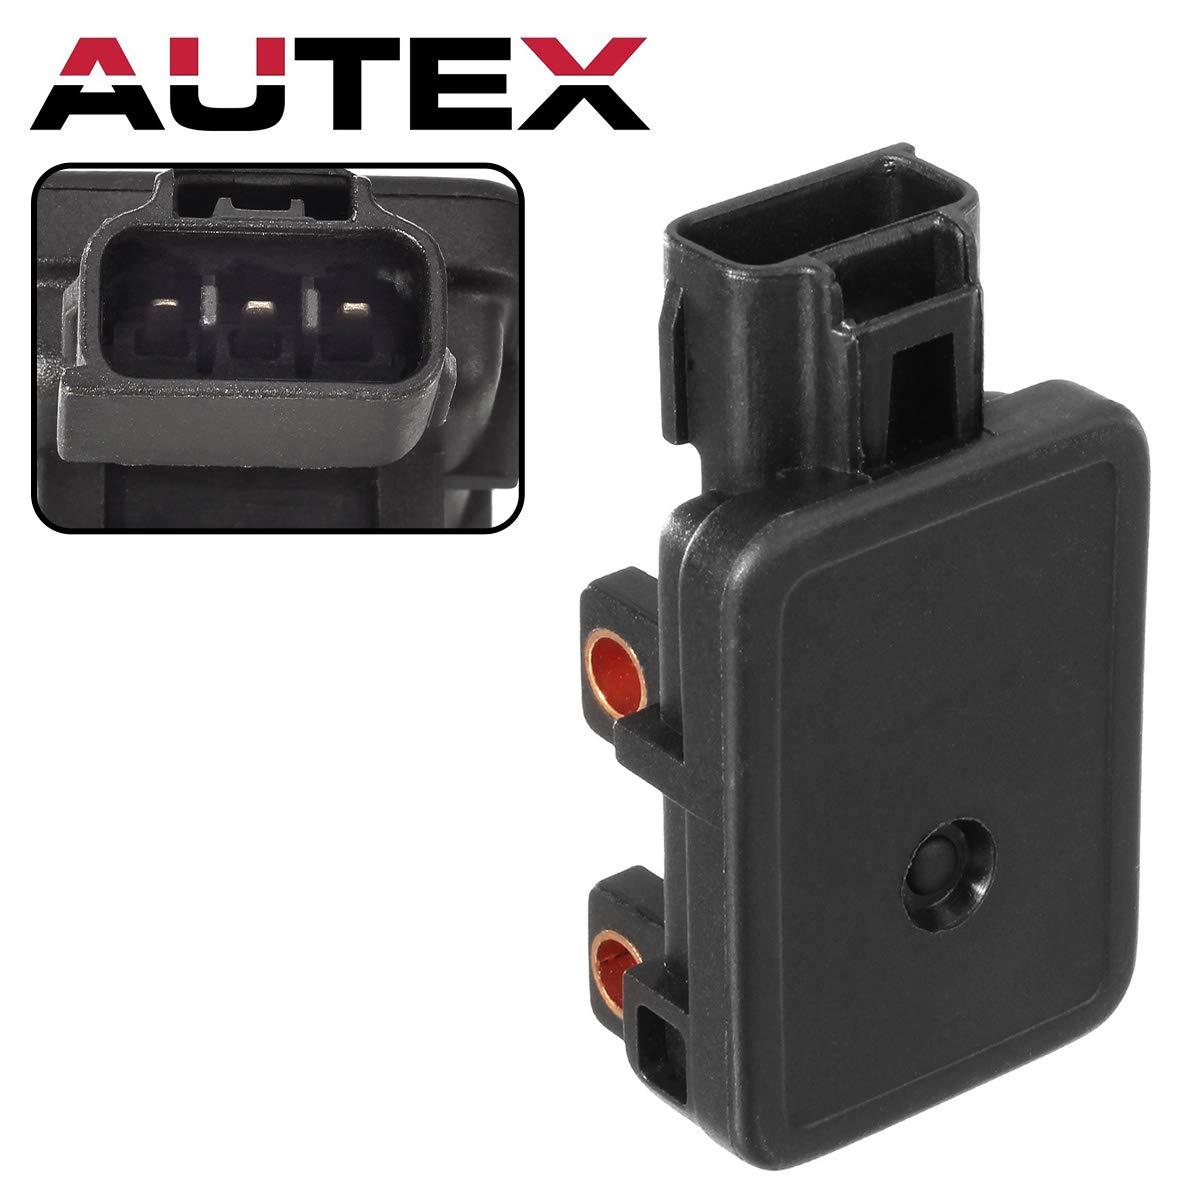 Autex 1x MAP Manifold Air Pressure Sensor AS88 AS88T compatible w/Dodge B1500 B2500 B3500 Dakota Durango Ram 1500, 1500 Van, 2500, 2500 Van, 3500, 3500 Van, Viper Jeep Cherokee Grand Cherokee TJ PartsSquare